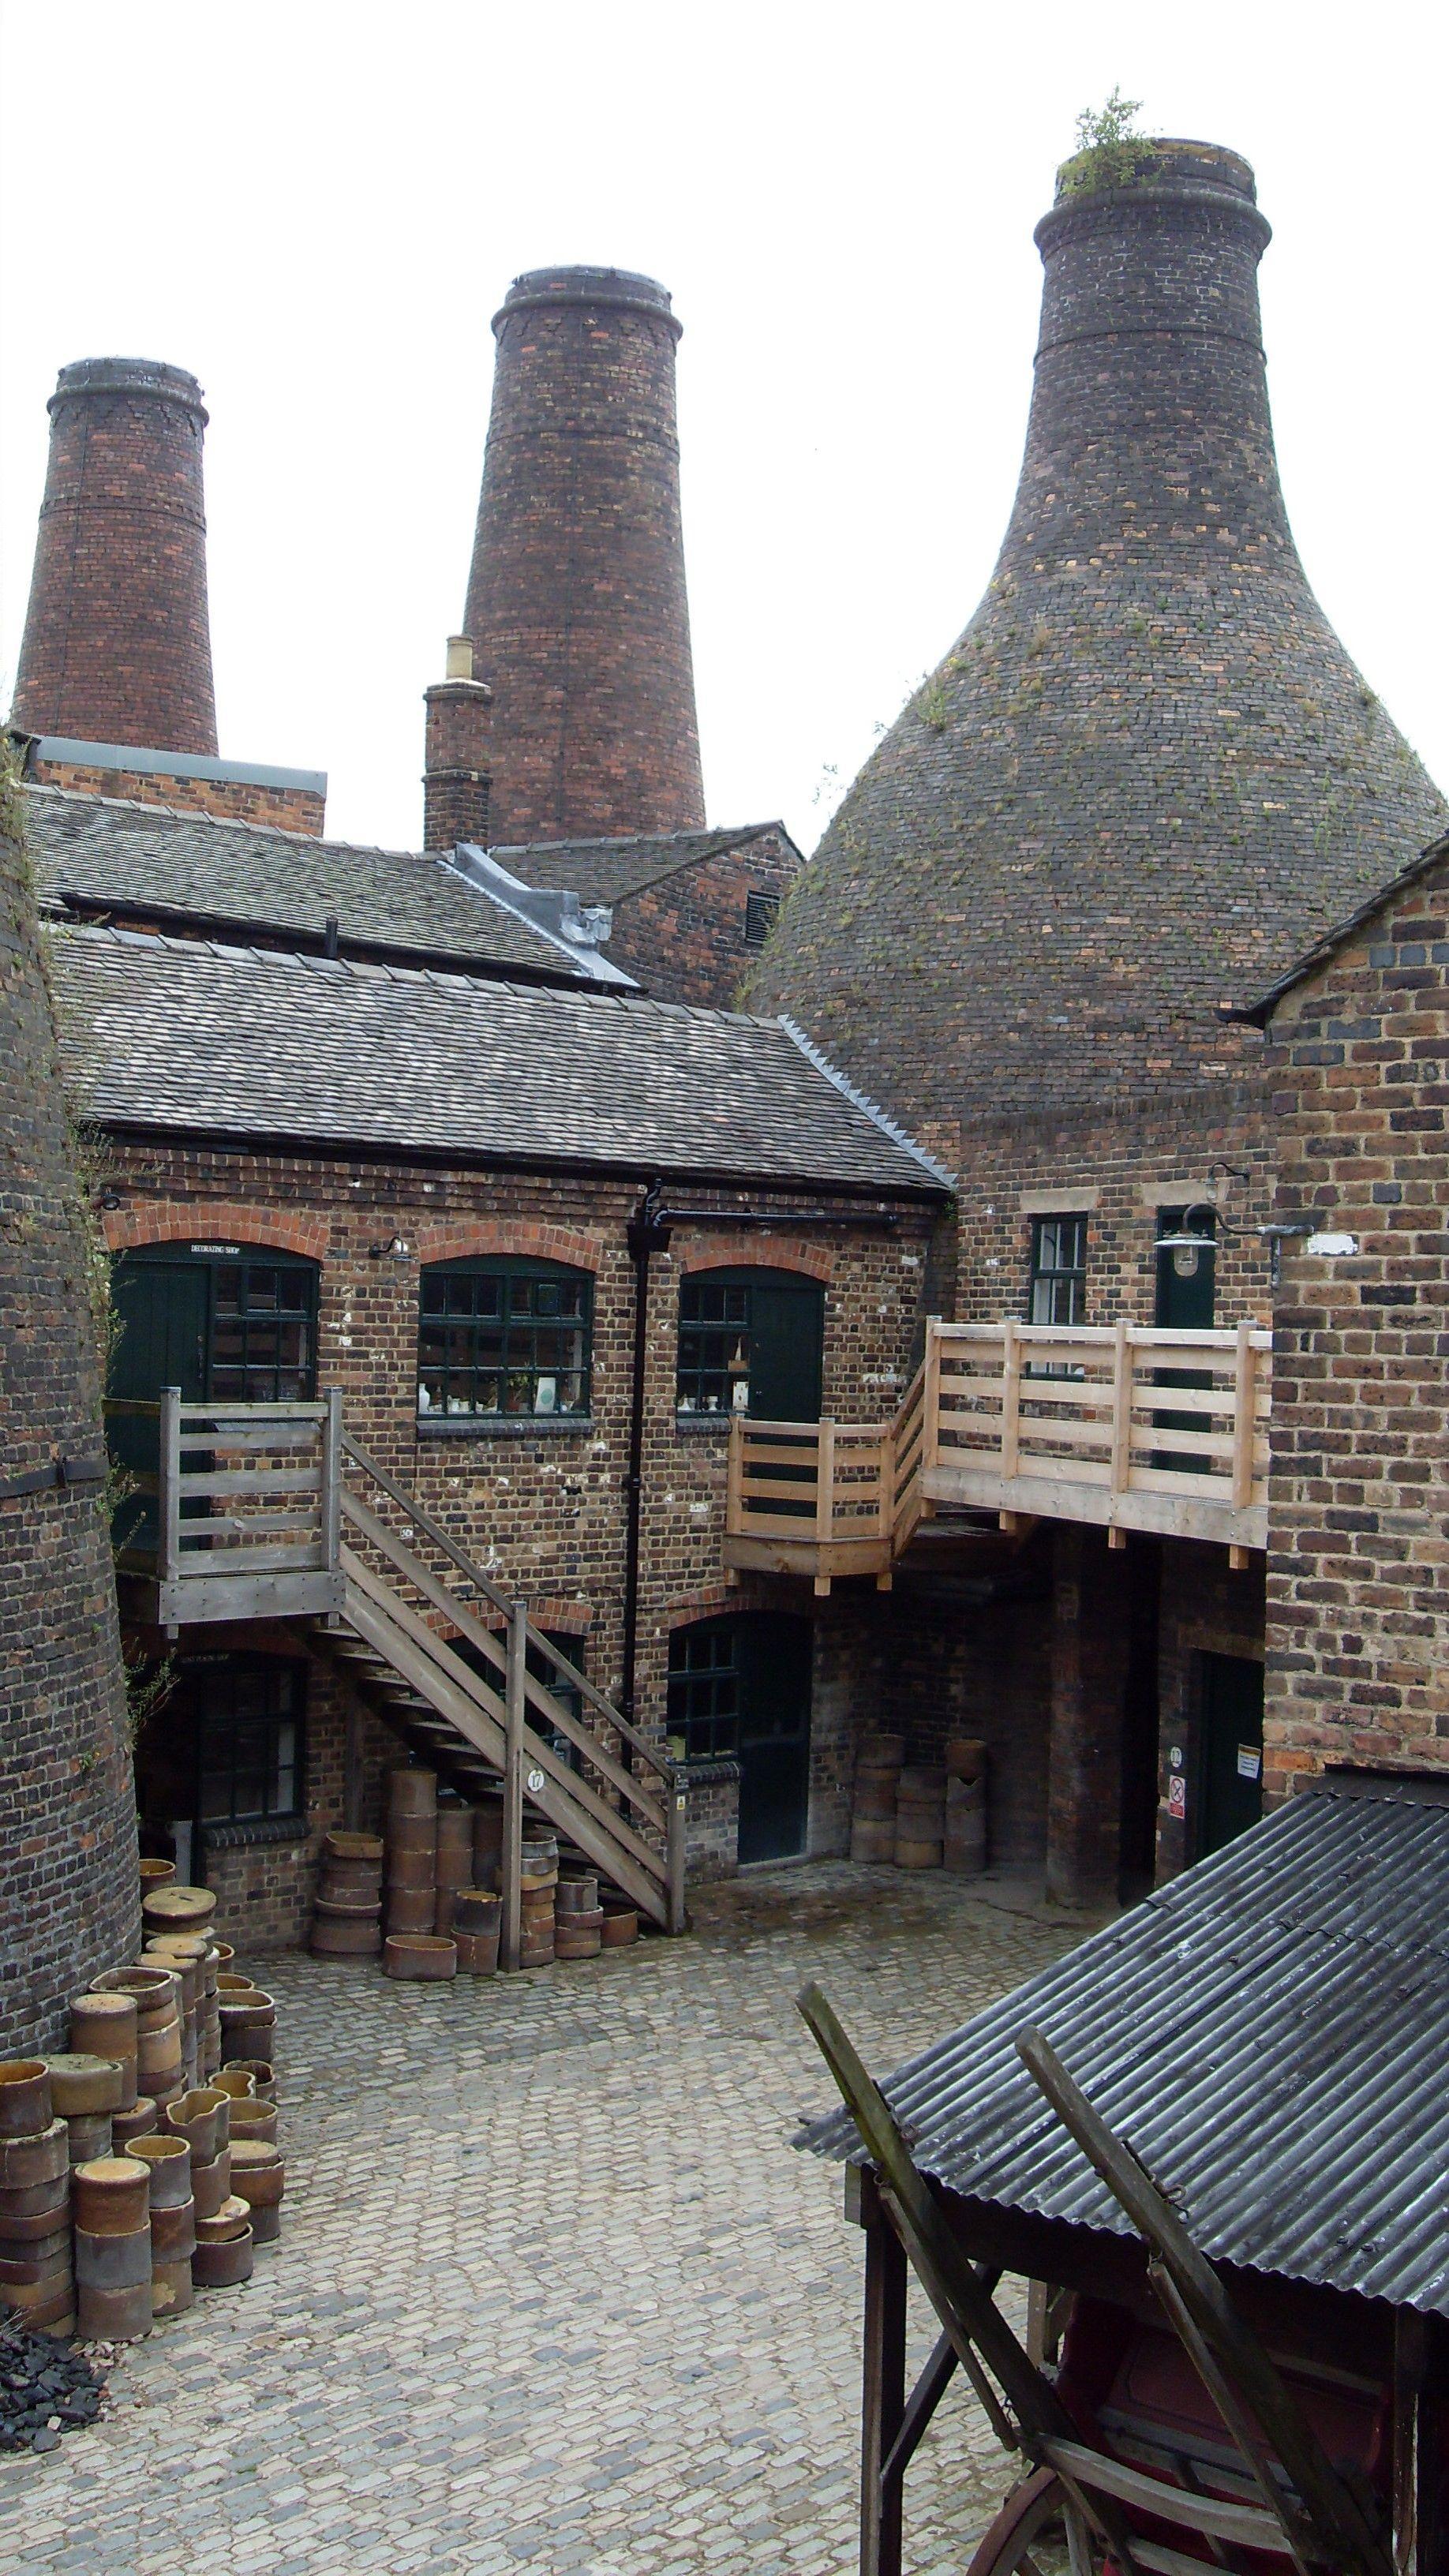 Gladstone Pottery, Stoke on Trent